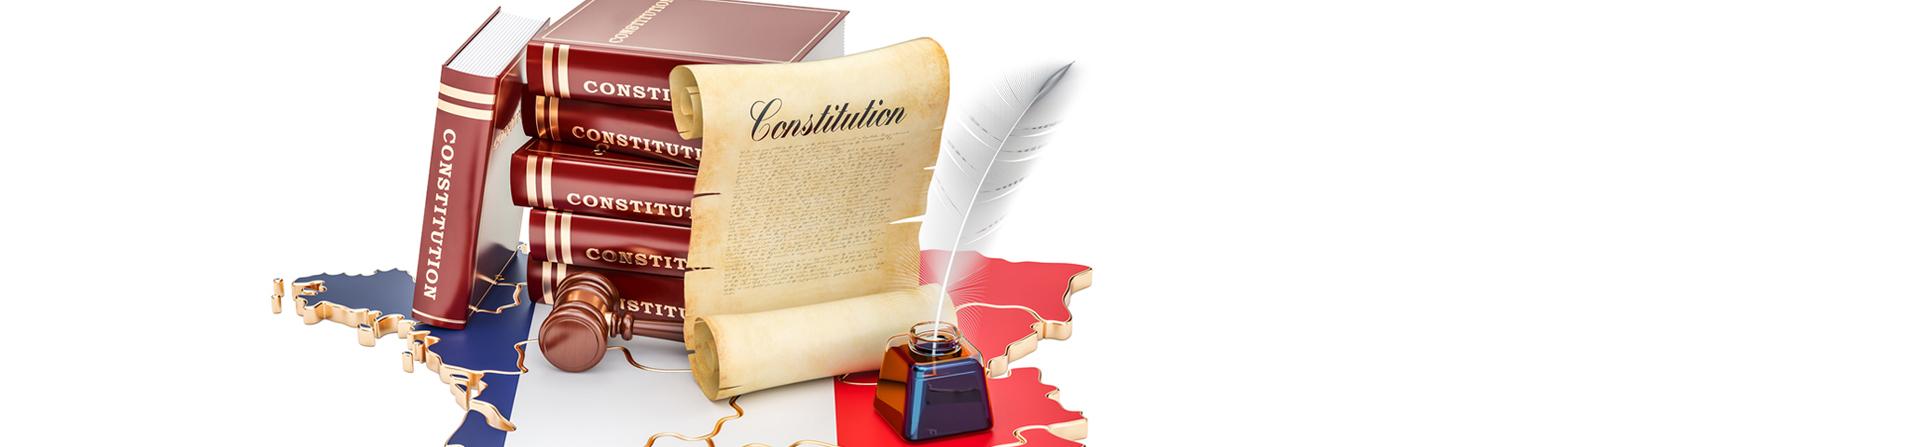 BA_IMH_Constitution_2018.jpg